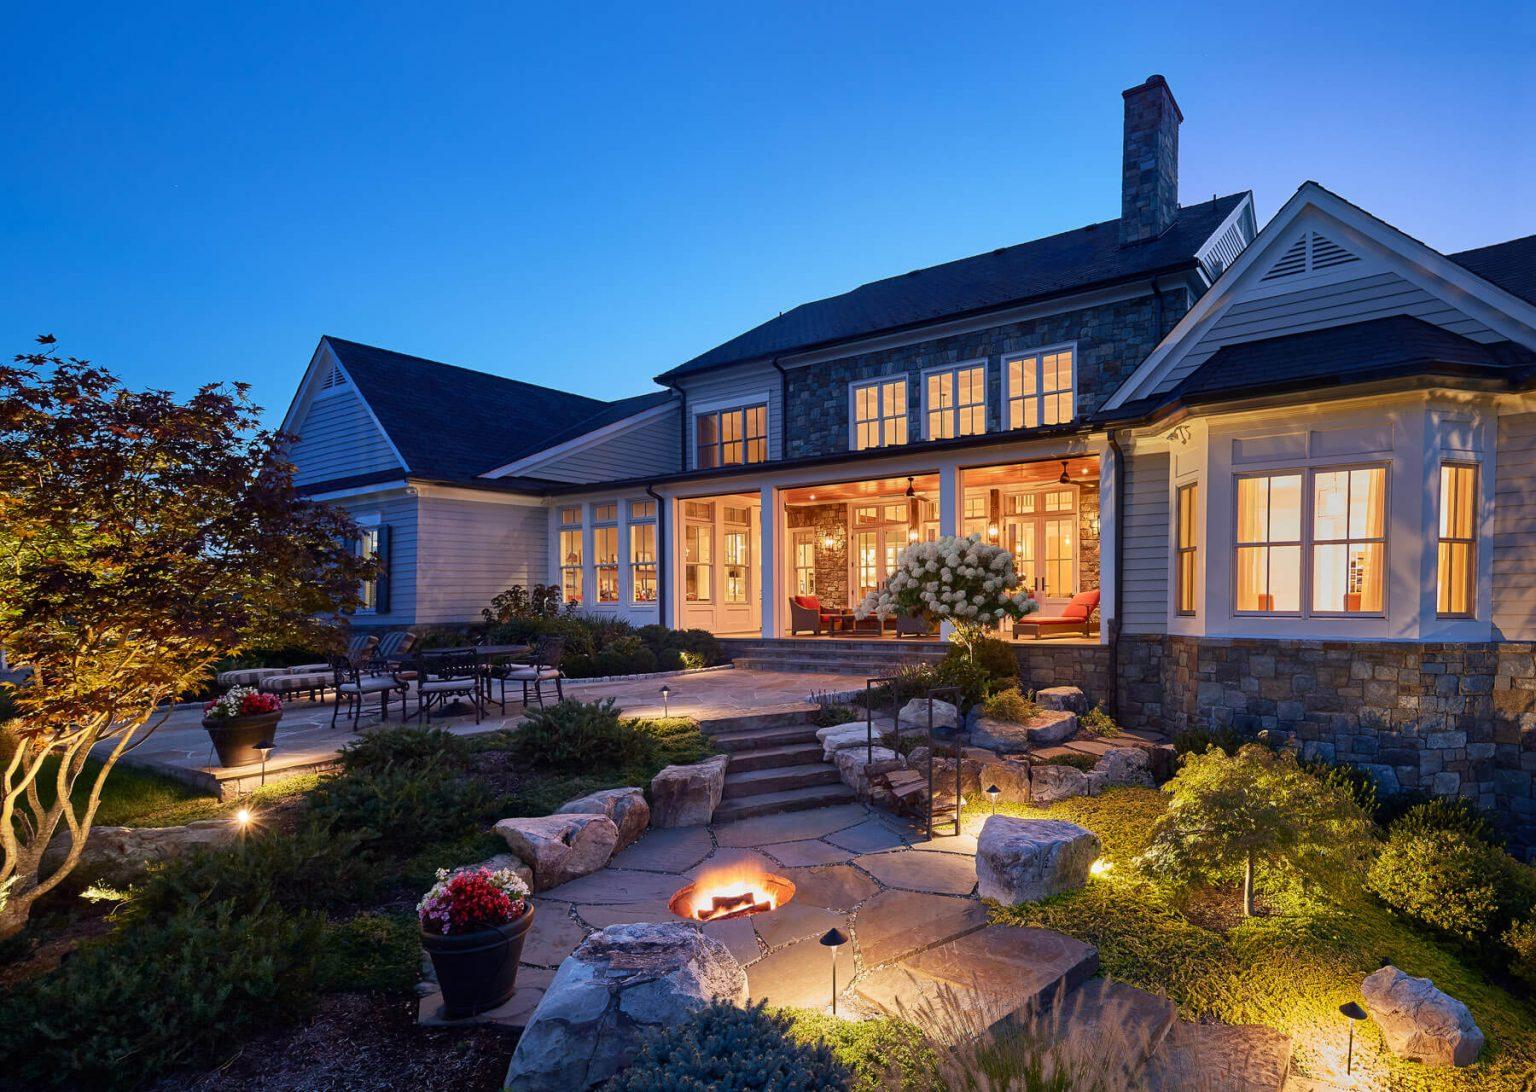 beautiful home with backyard patio with stonework